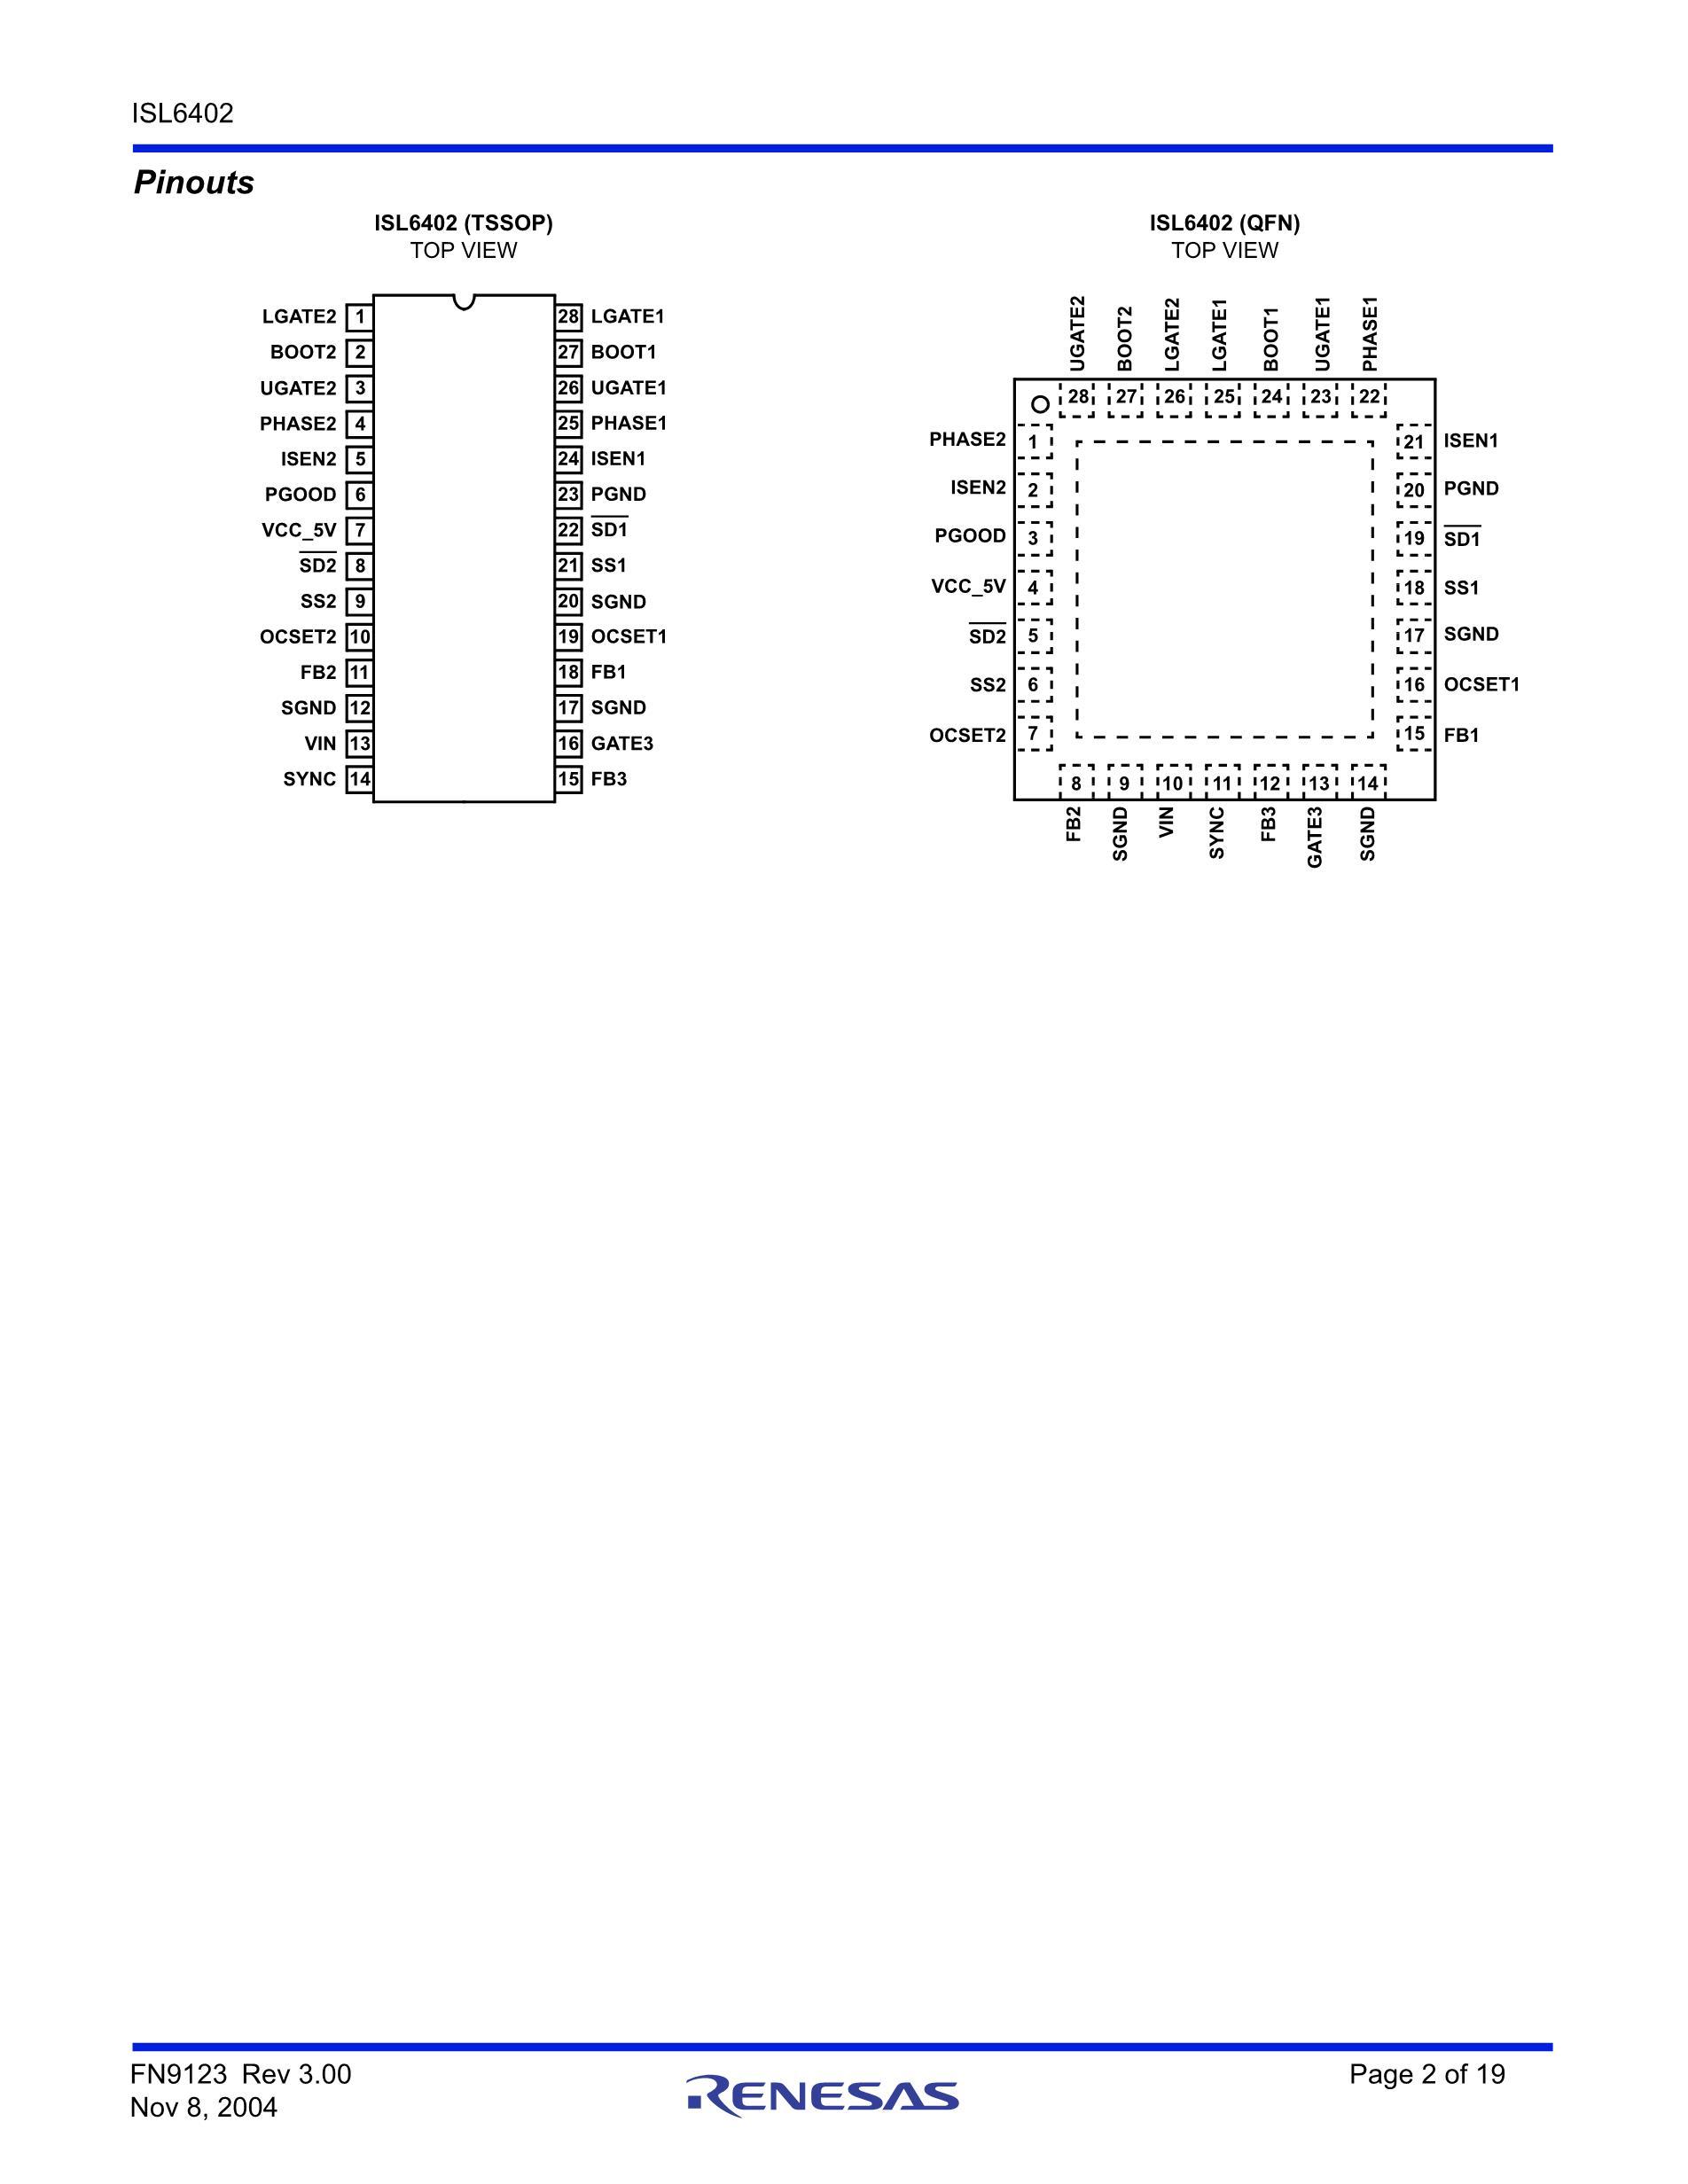 ISL6402IVZ-T's pdf picture 2